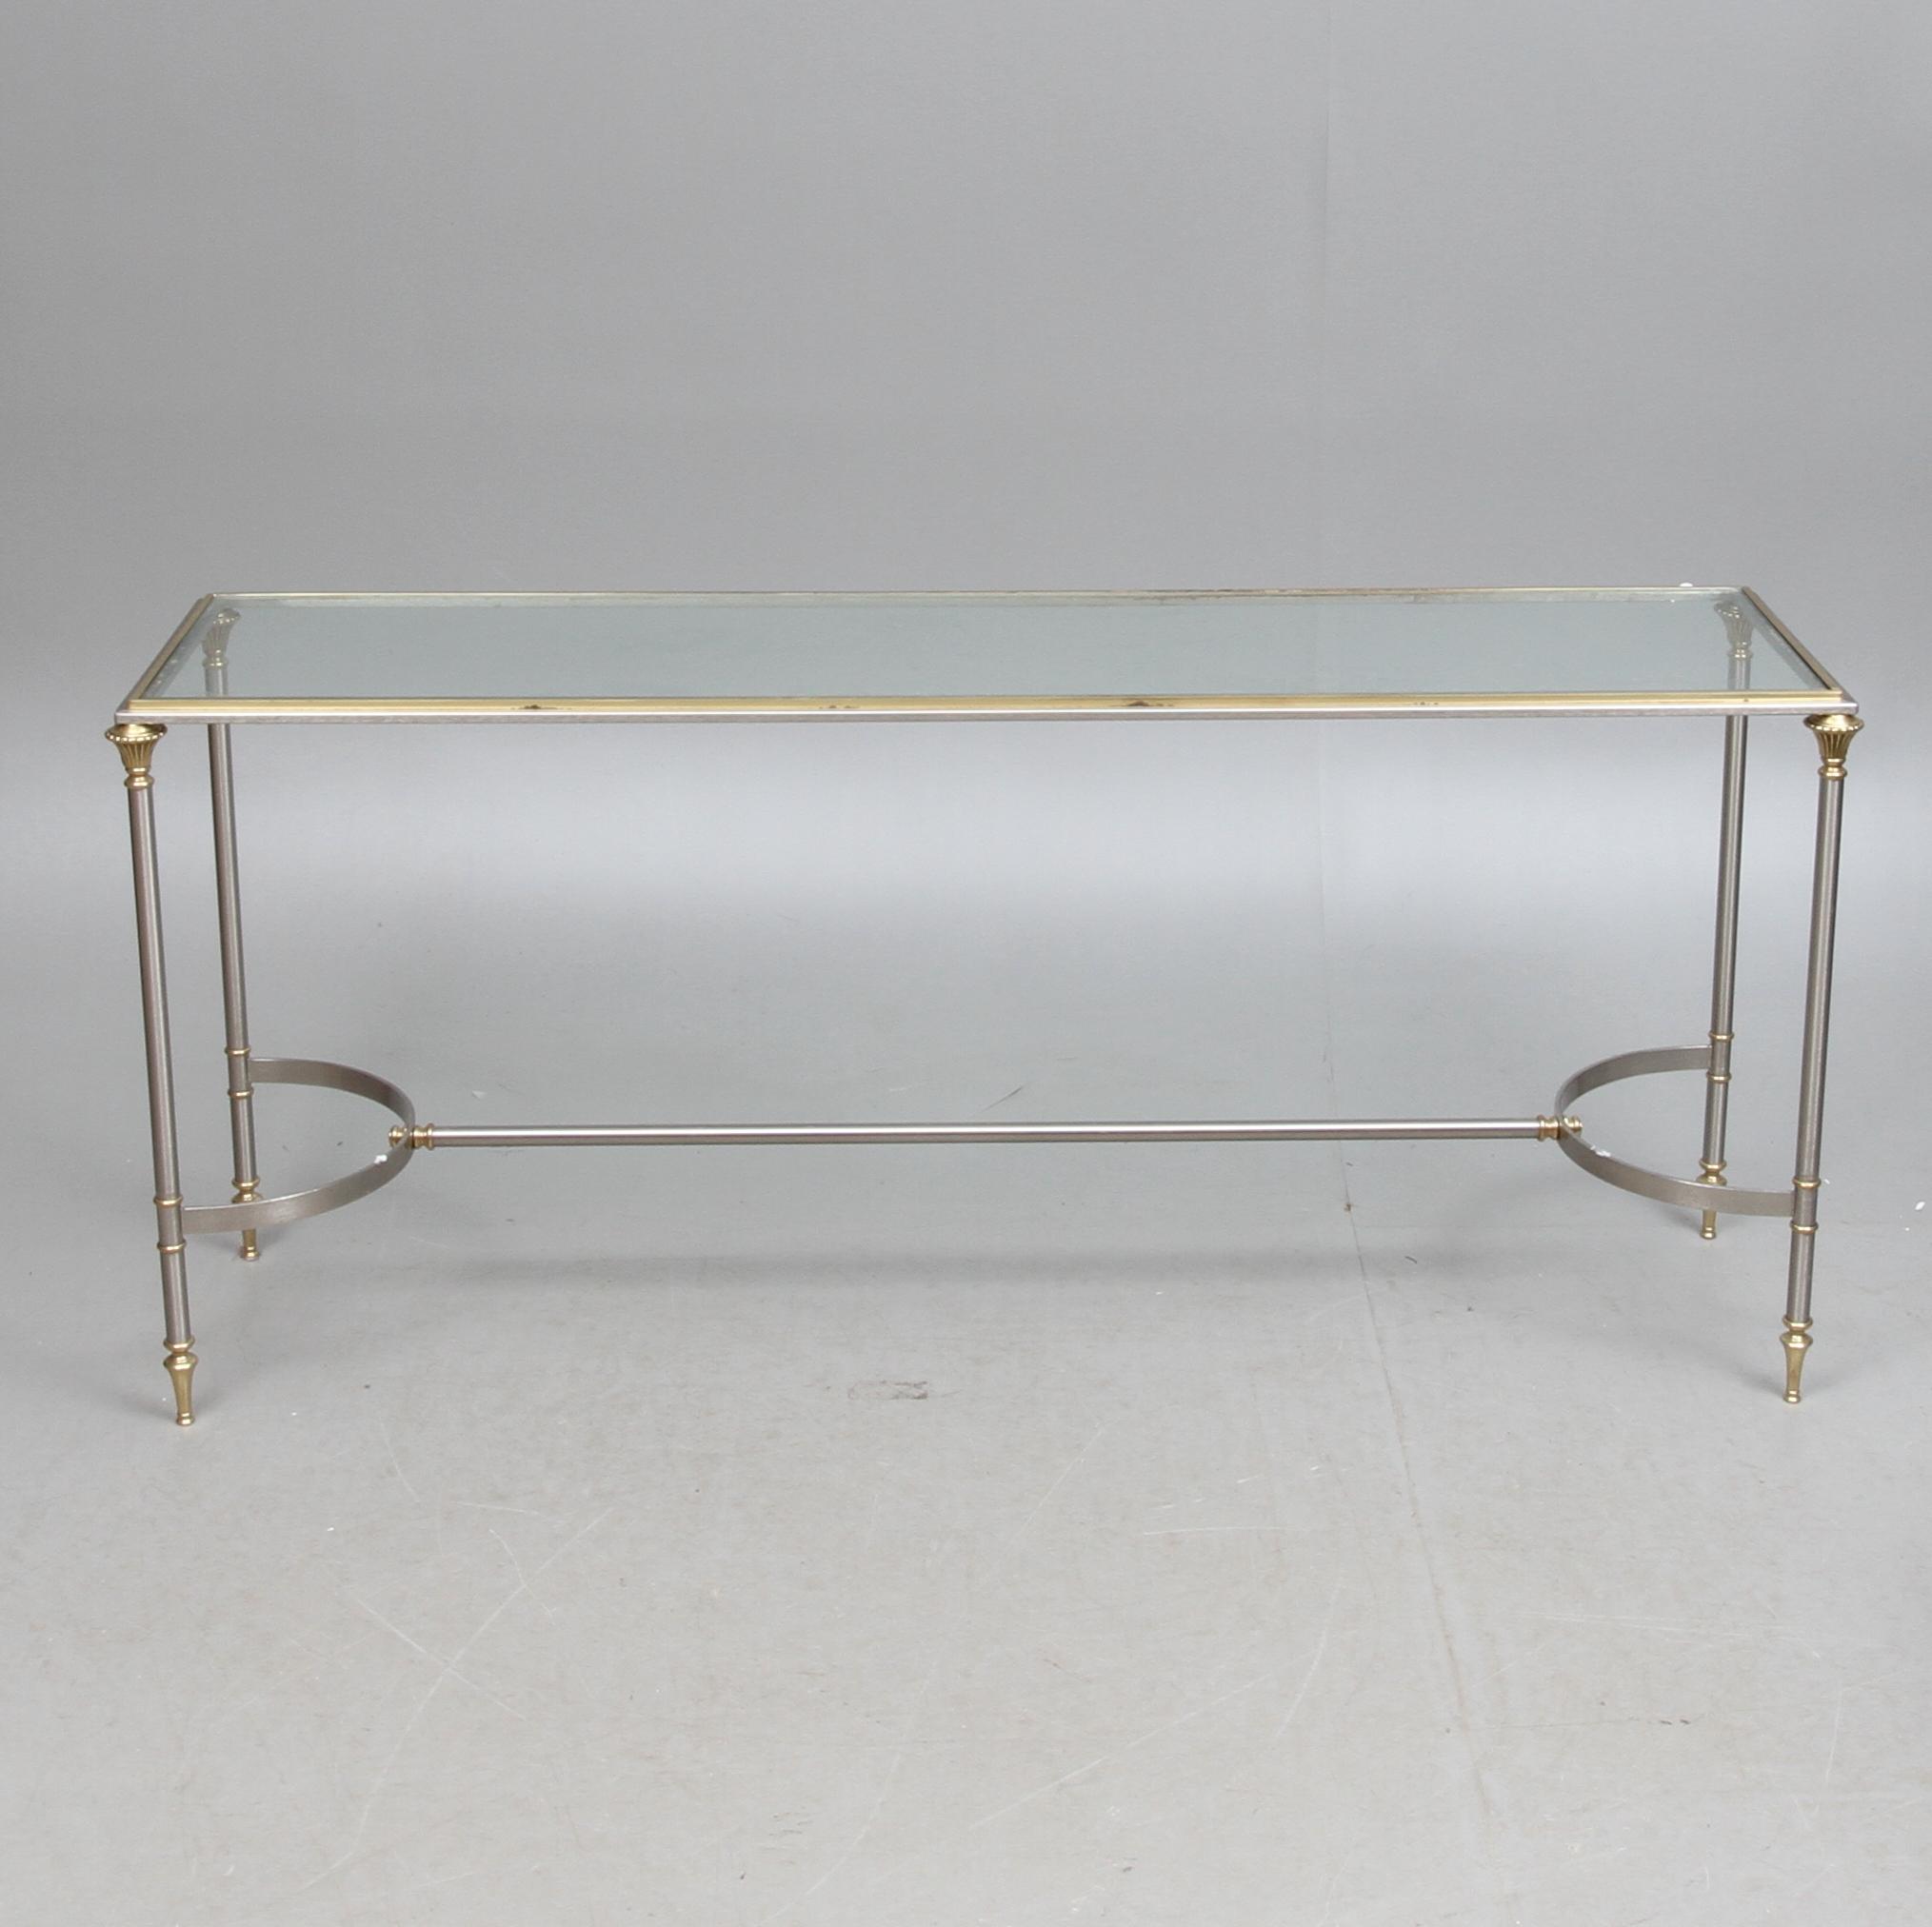 Sideboard Glas Och Metall 1900 Talets Andra Halft Furniture